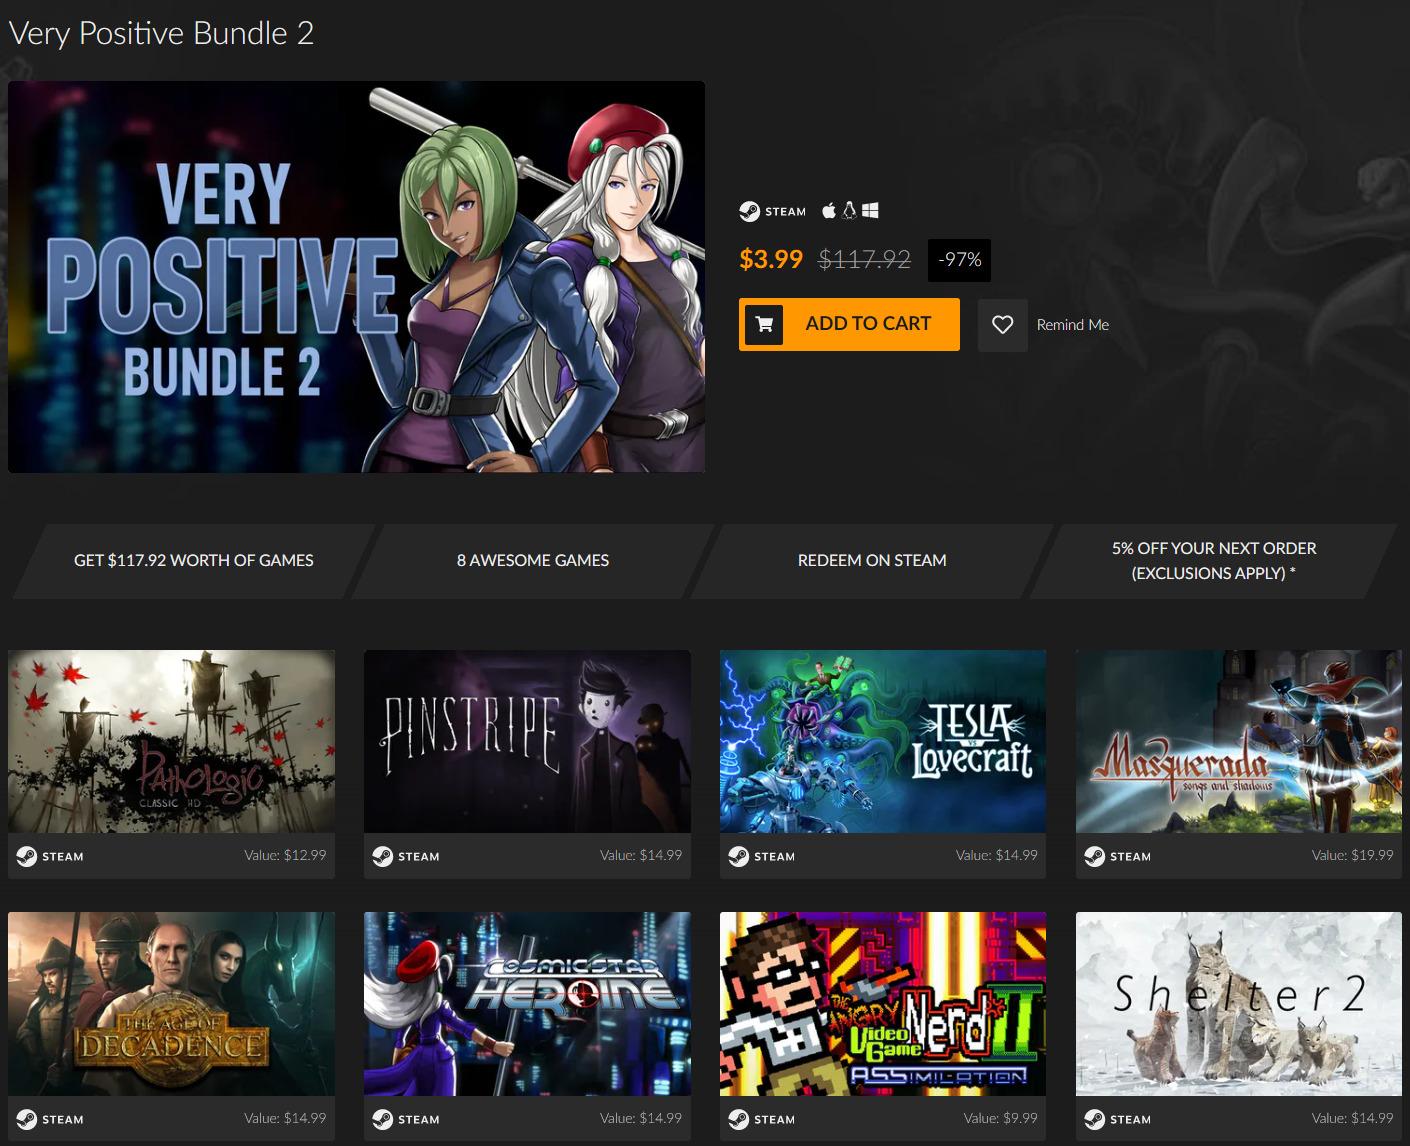 Screenshot_2020-05-05 Very Positive Bundle 2 Steam Game Bundle Fanatical.jpg